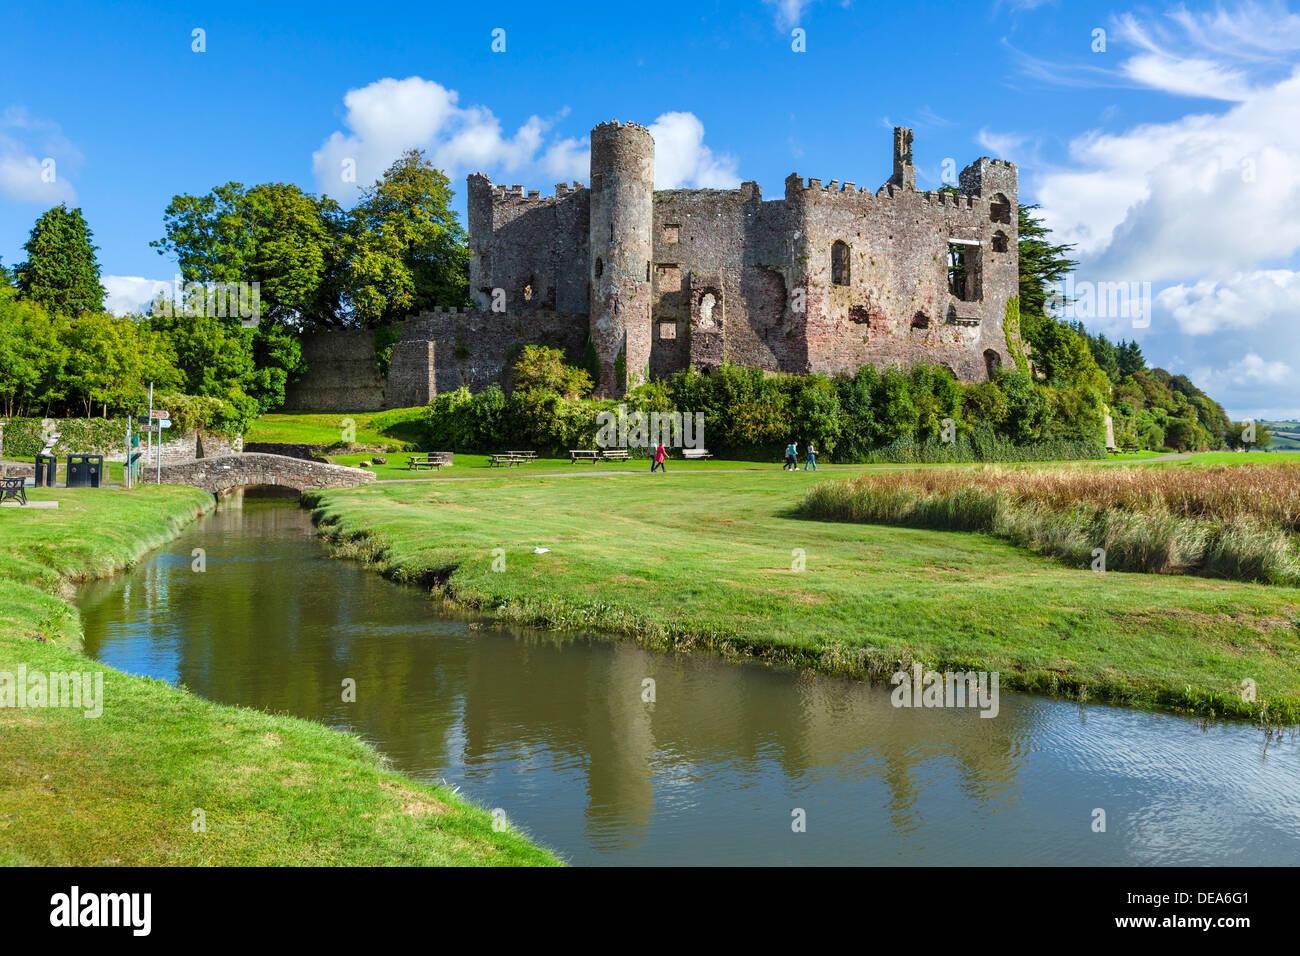 Laugharne Castle, Laugharne, Carmarthenshire, Wales, UK - Stock Image